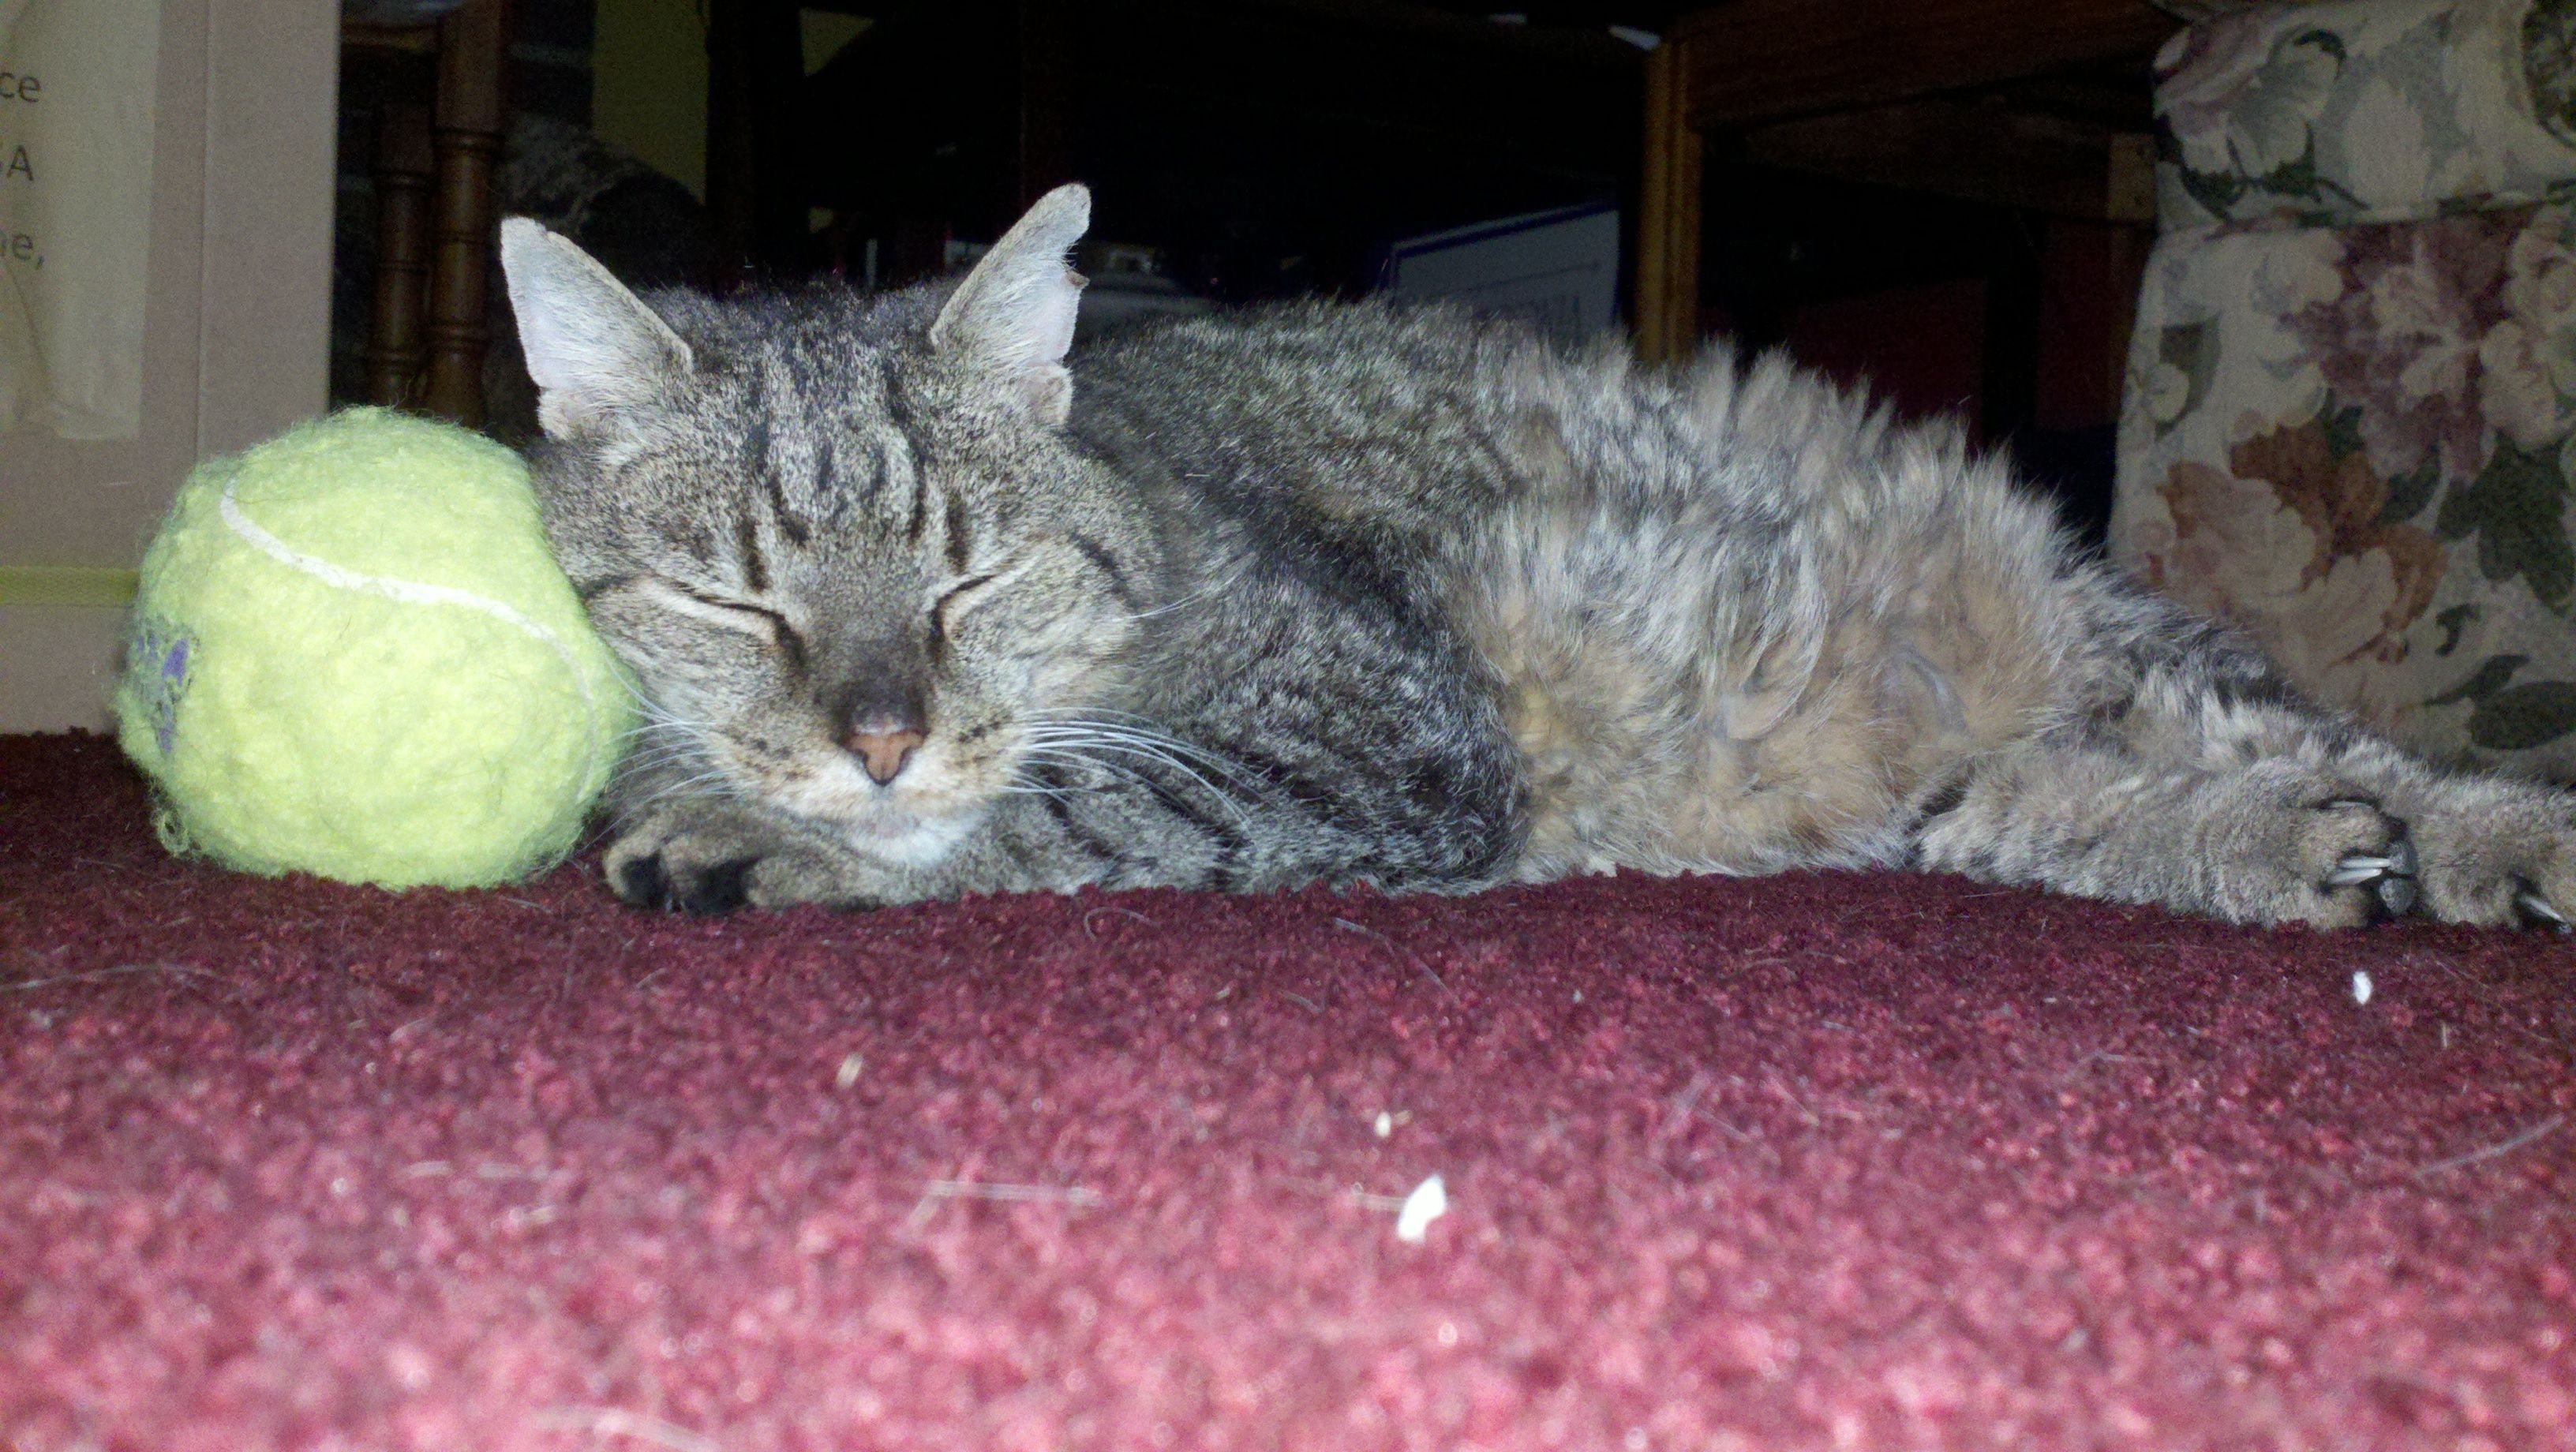 Lucky Cat taking a Nap with a Tennis Ball Pillow